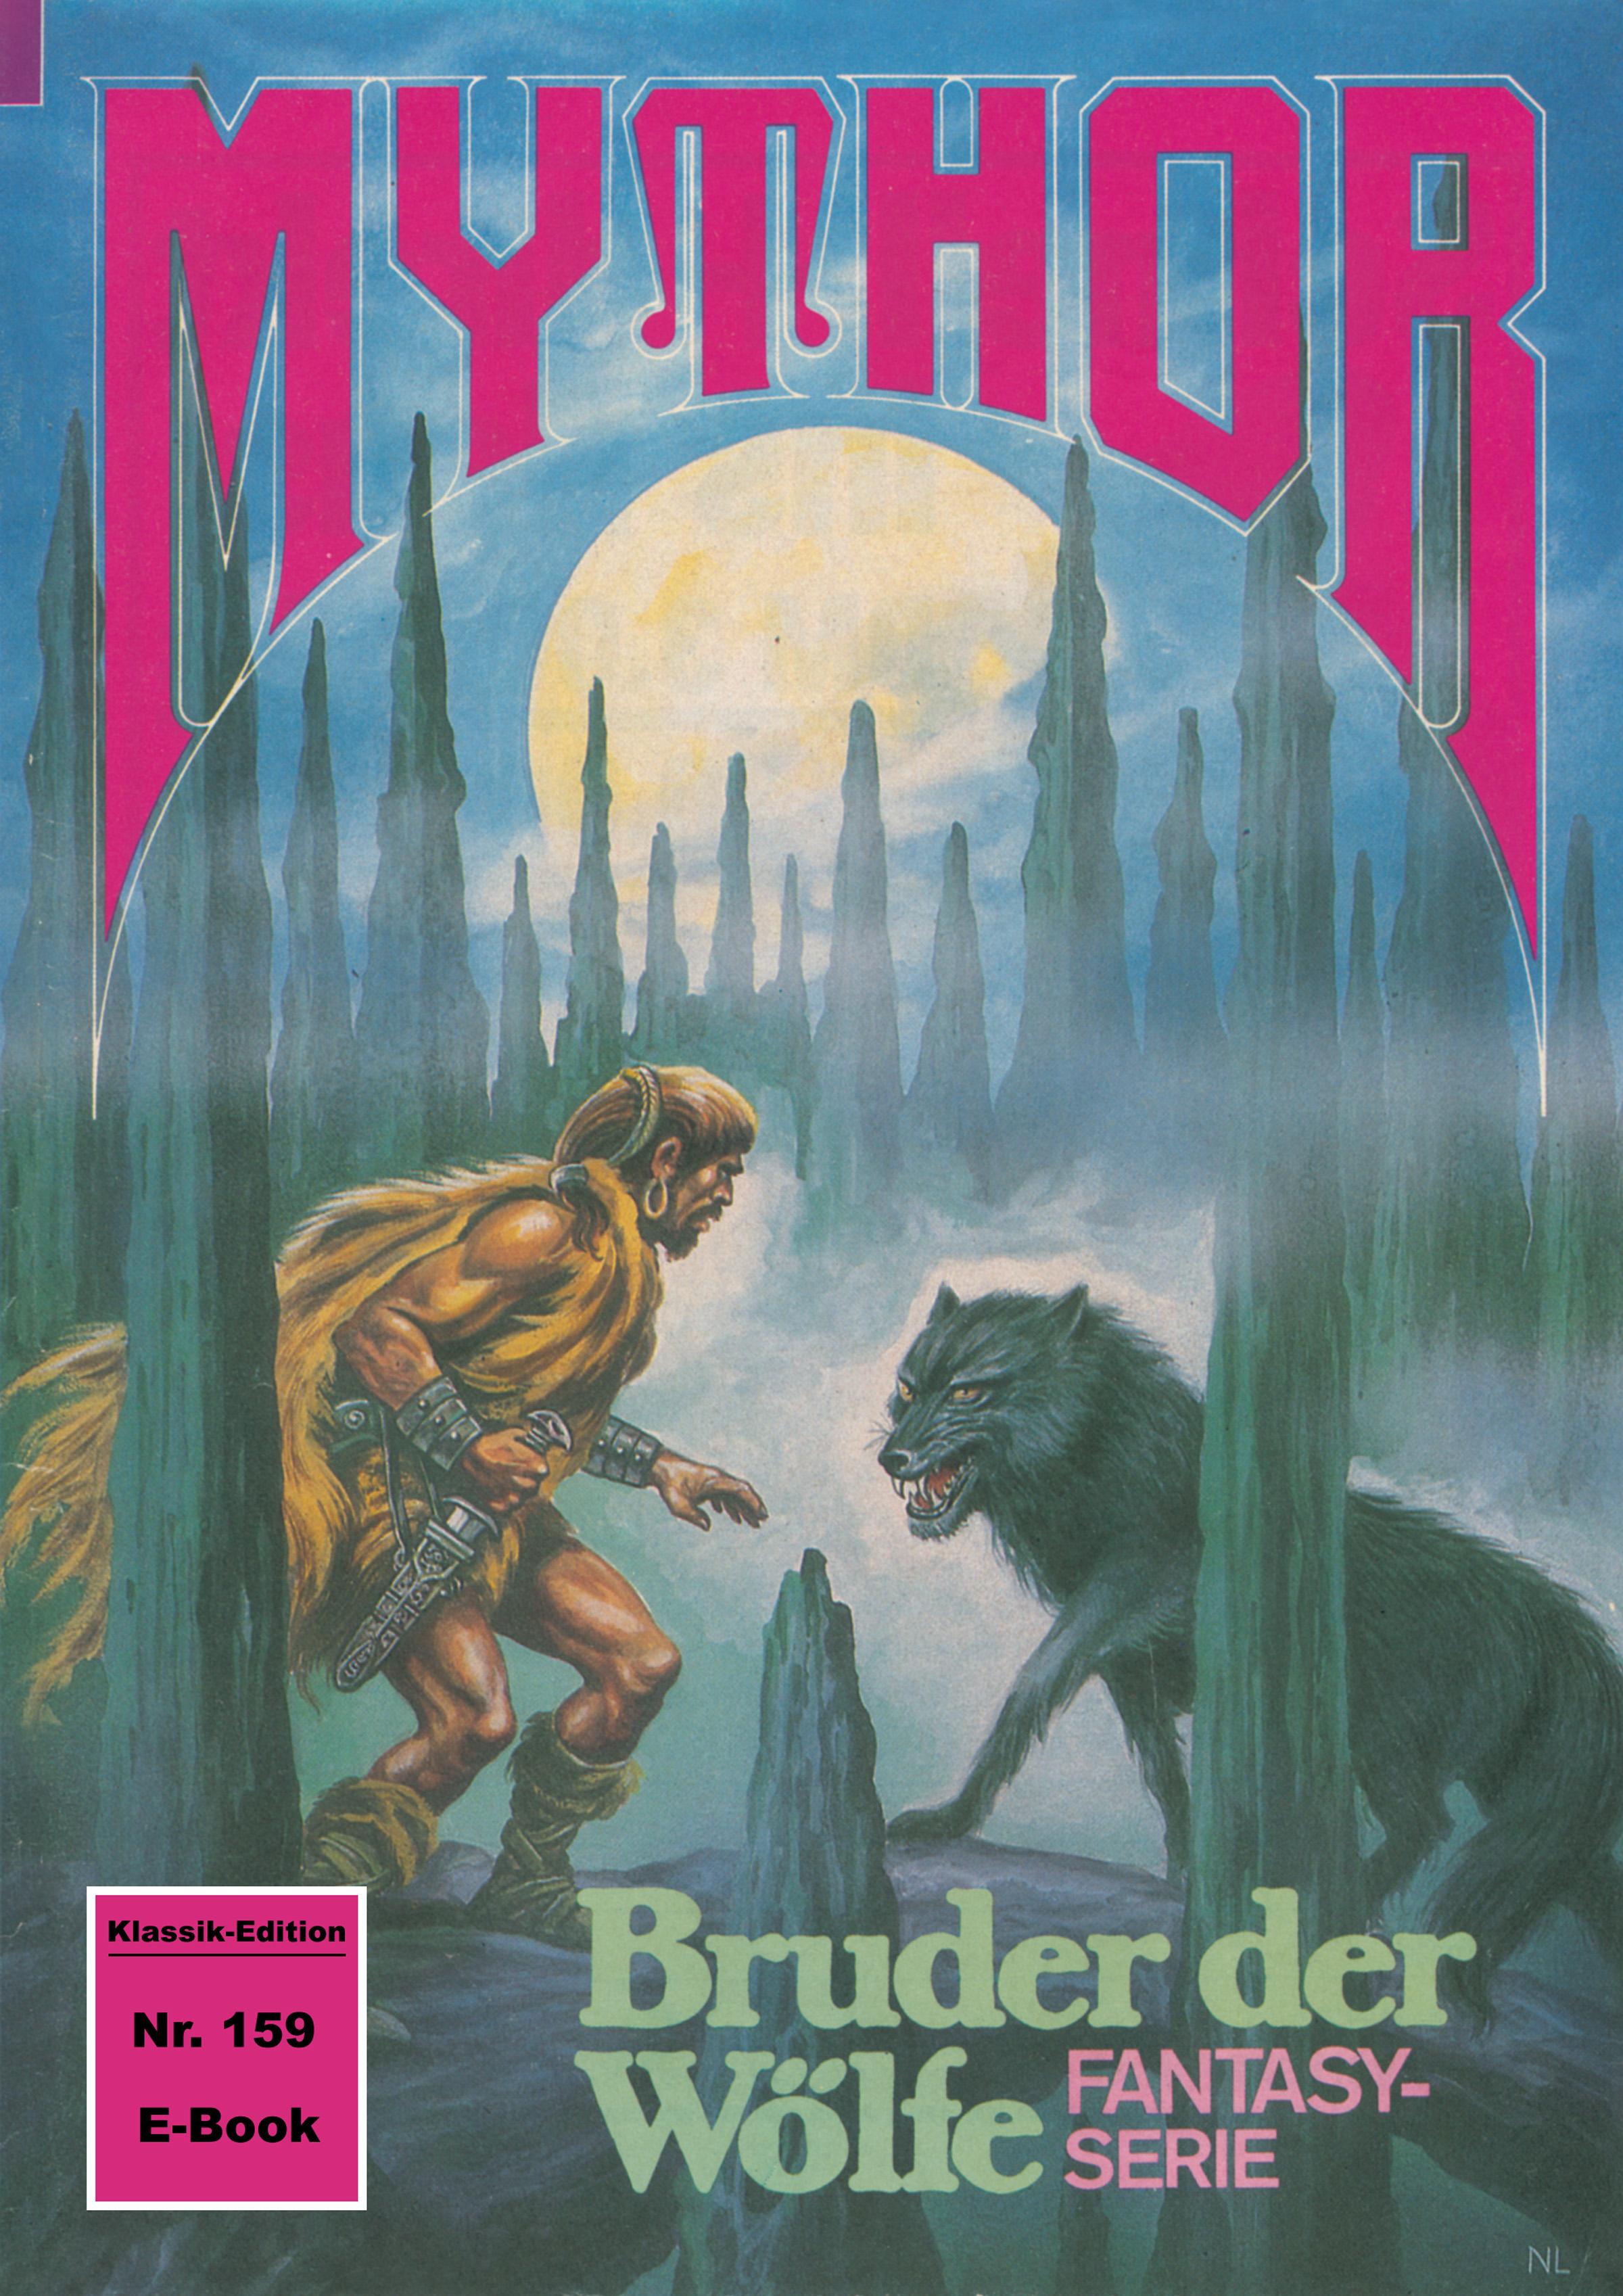 Peter Terrid Mythor 159: Bruder der Wölfe peter terrid mythor 117 herrscher im unsichtbaren